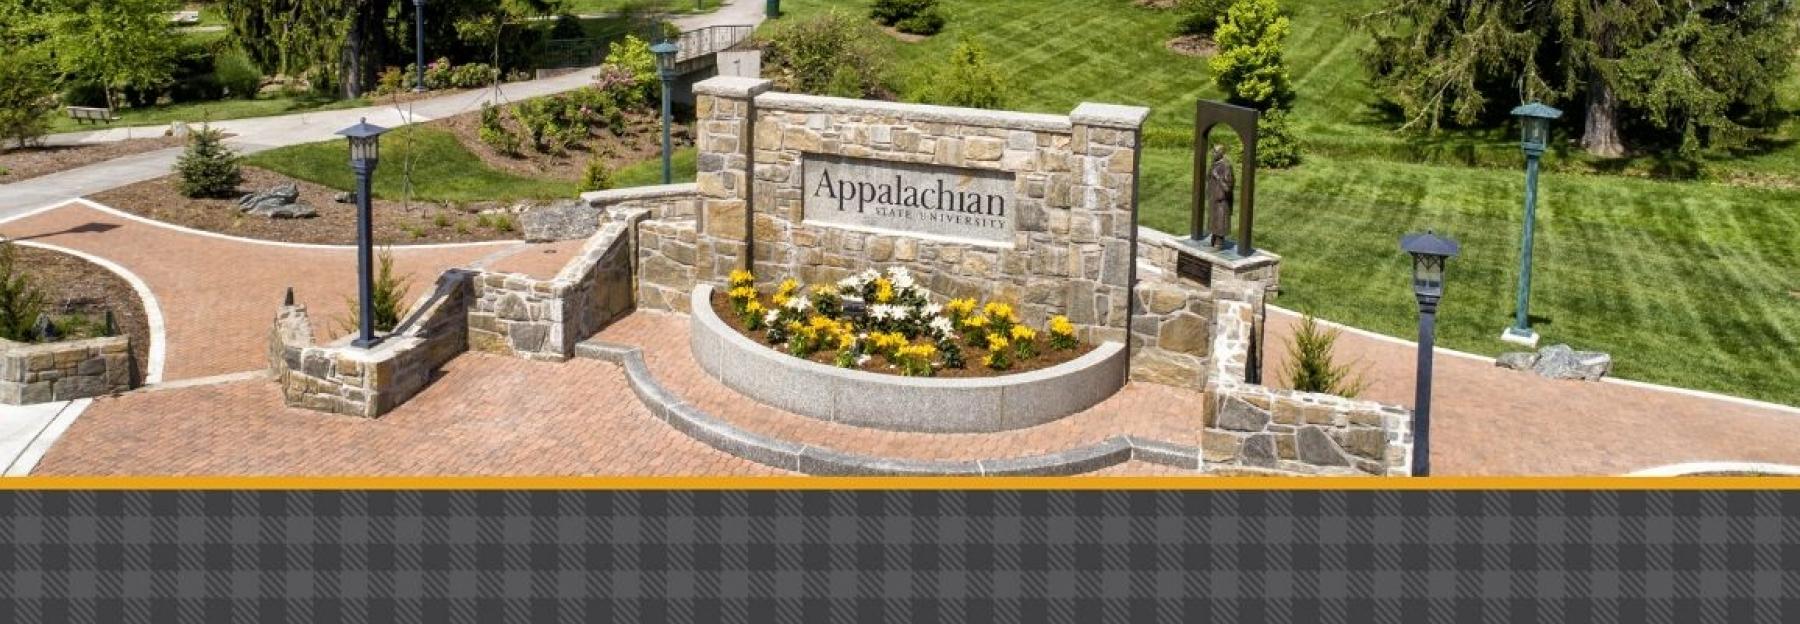 Appalachian main sign and entrance